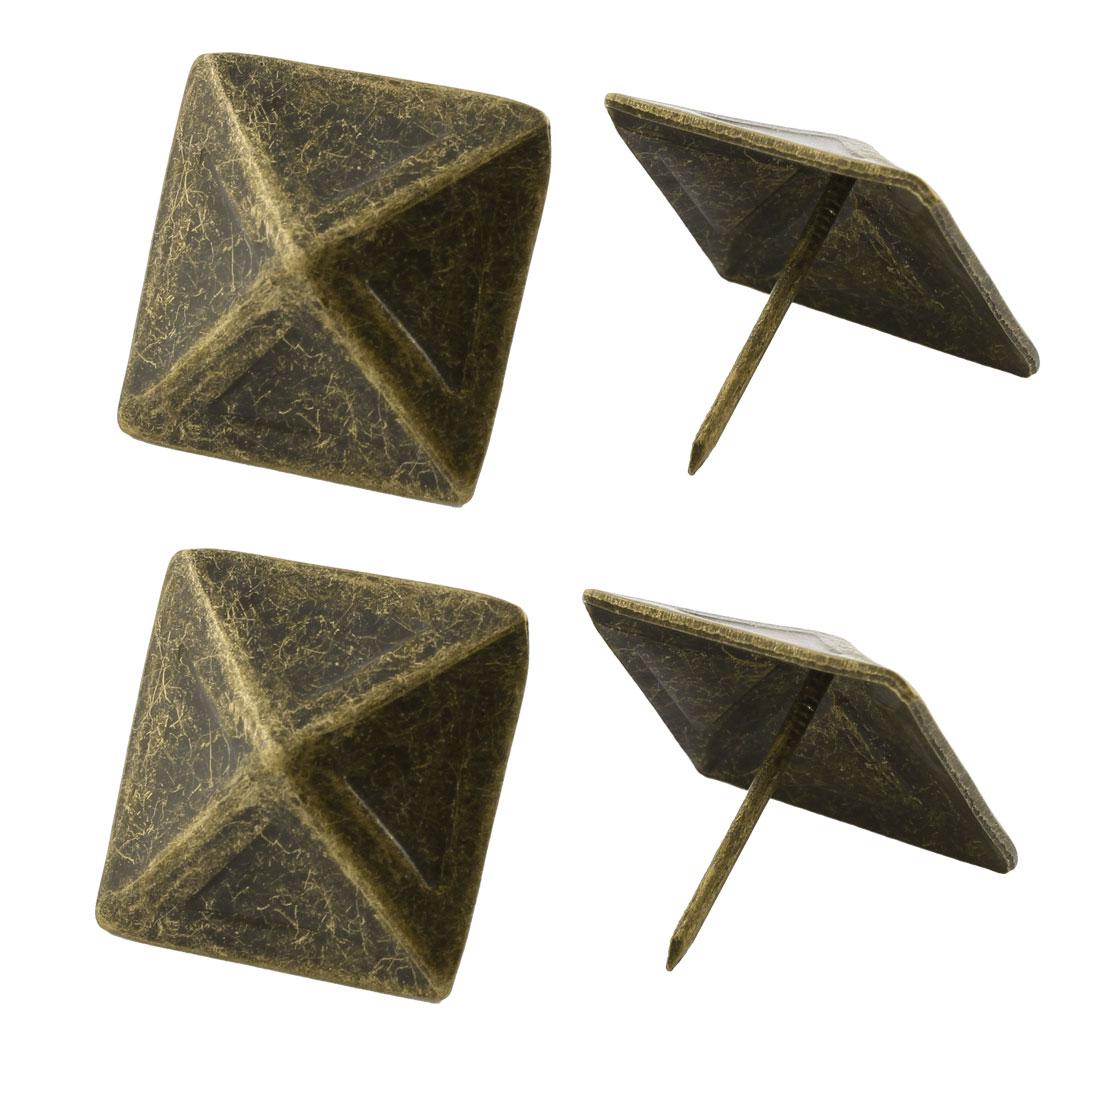 3cm Metal Square Pin Furniture Decorative Domed Nails Bronze Tone 4Pcs